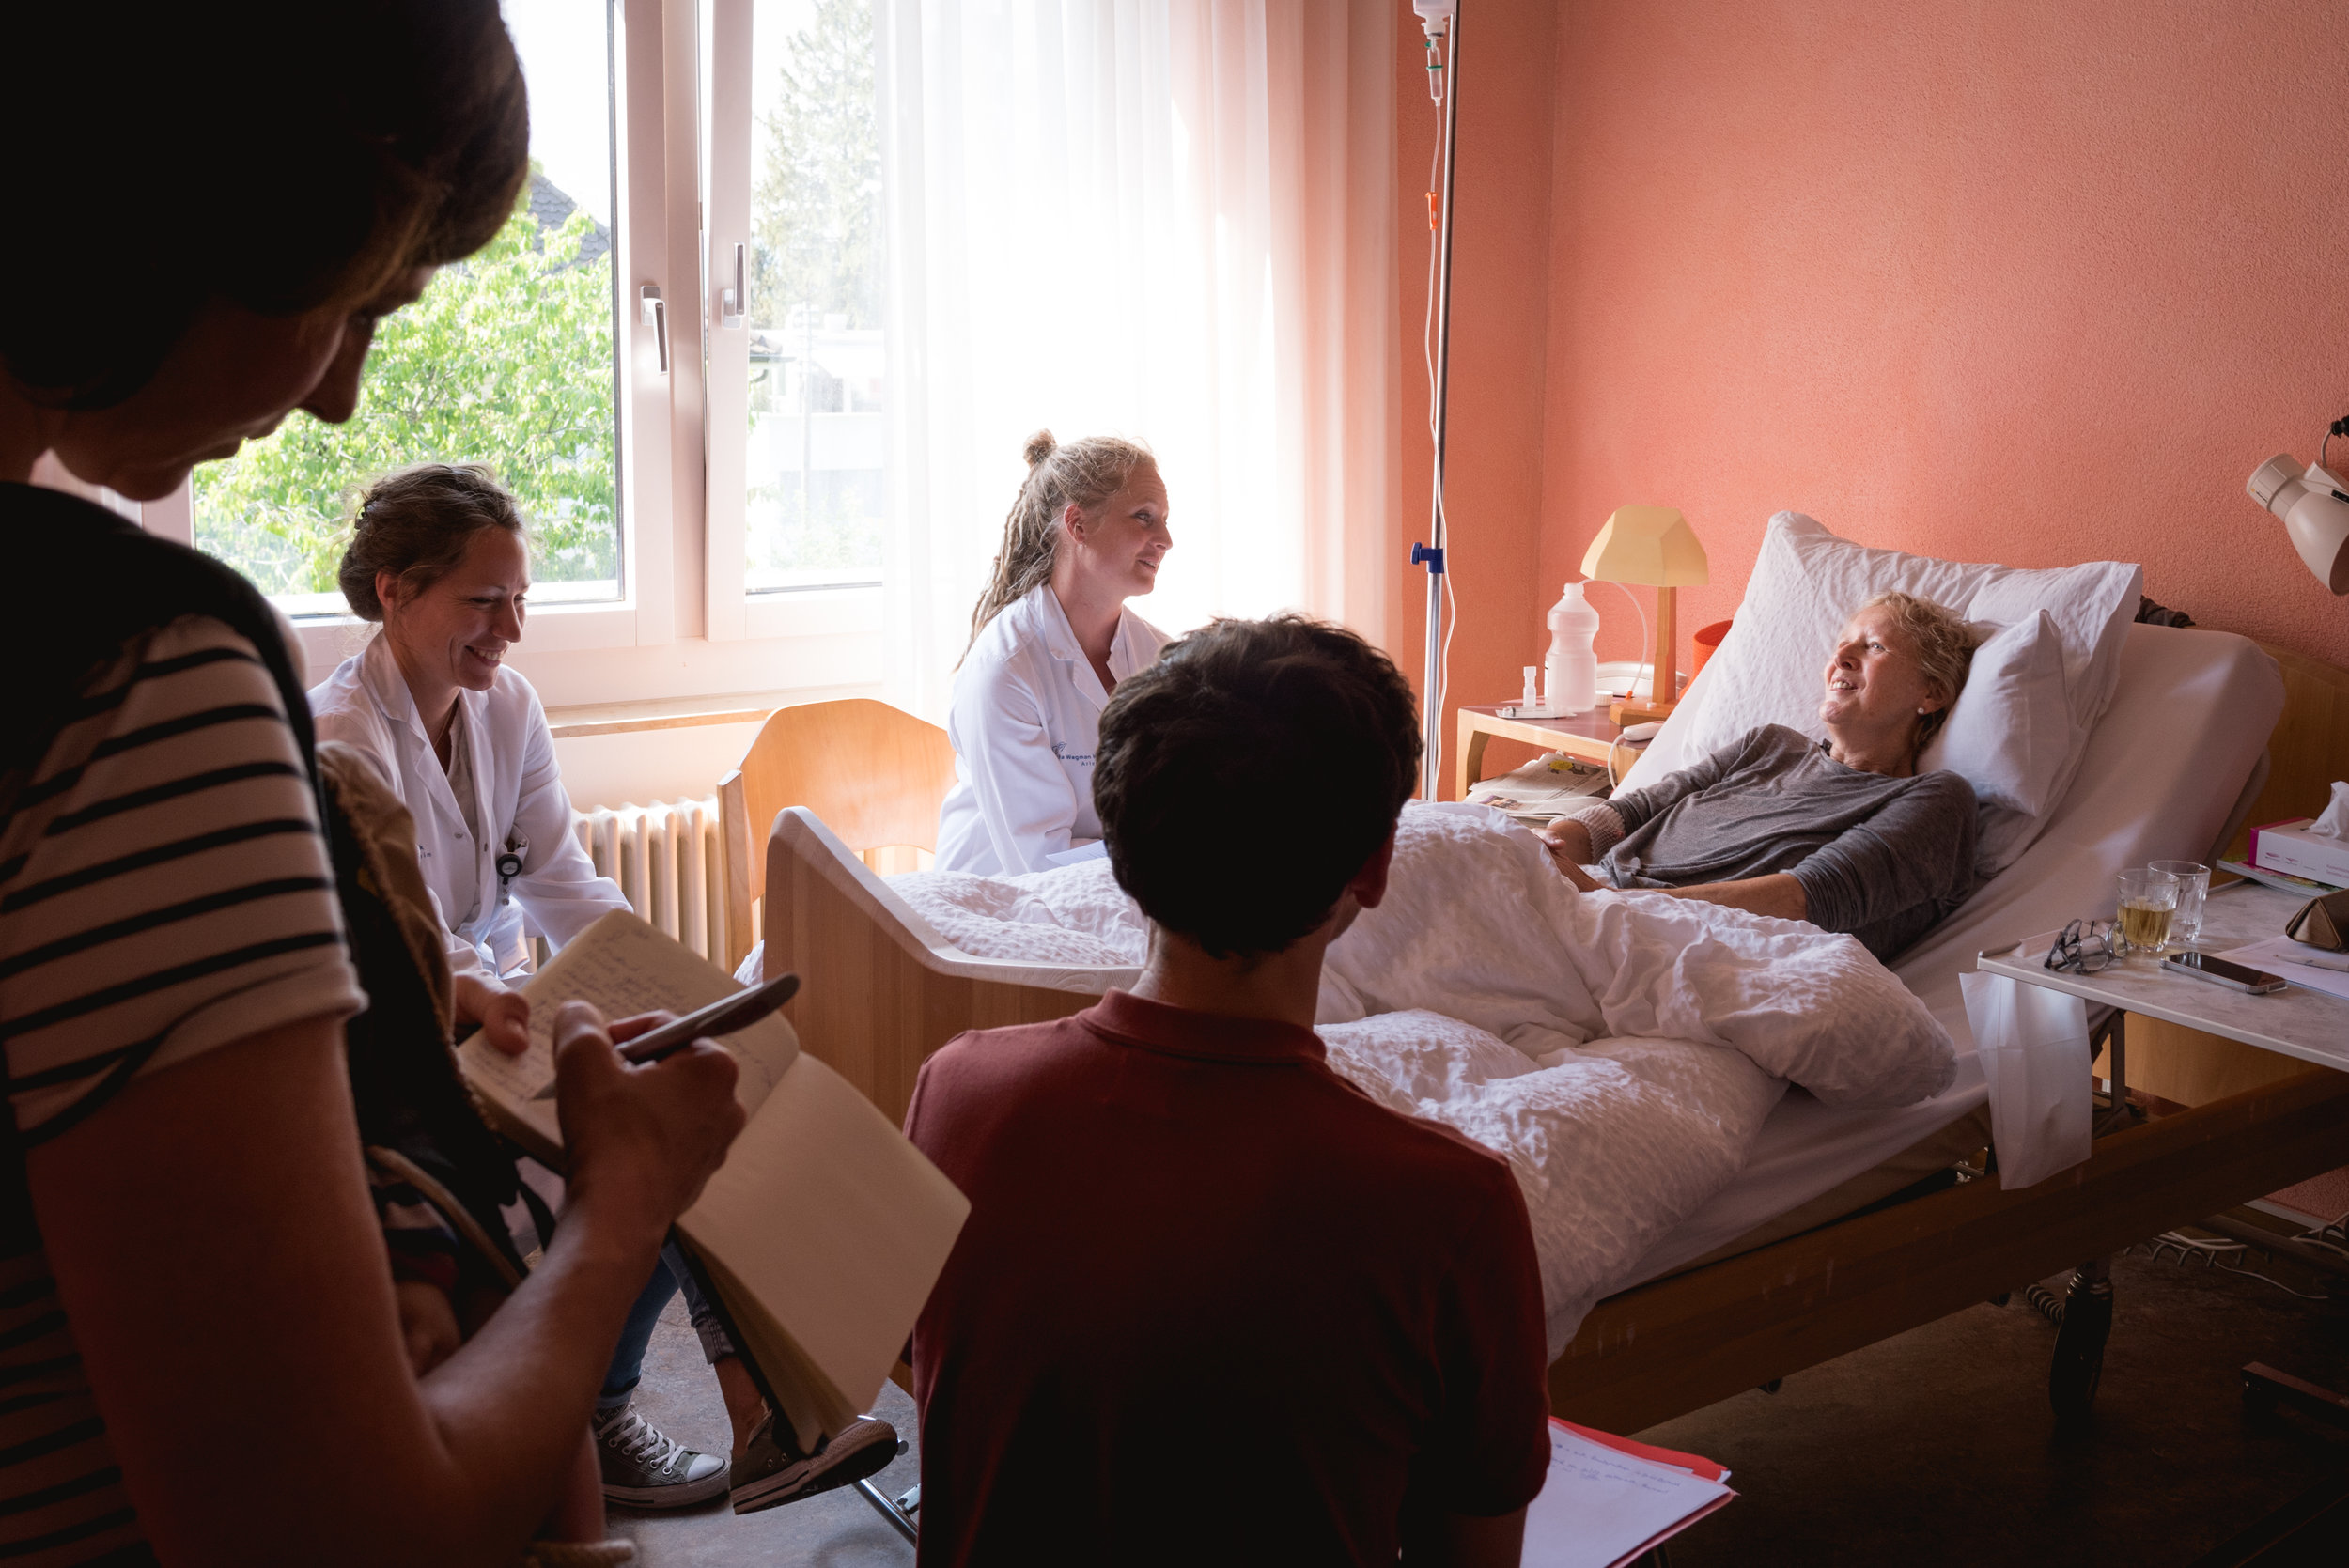 Klinik-Arlesheim-234.jpg